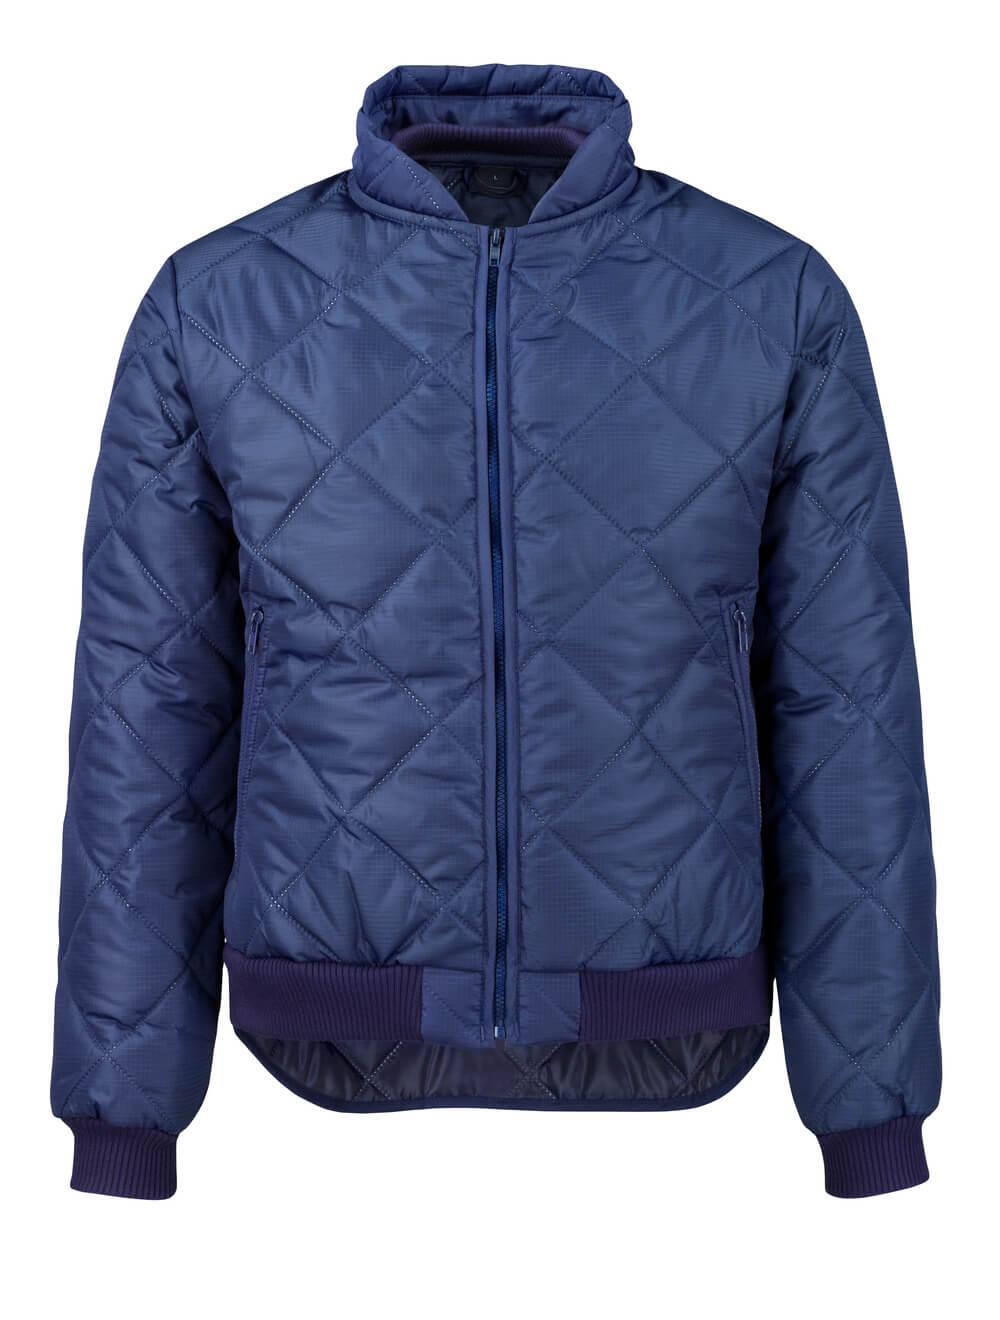 13515-905-01 Chaqueta térmica - azul marino